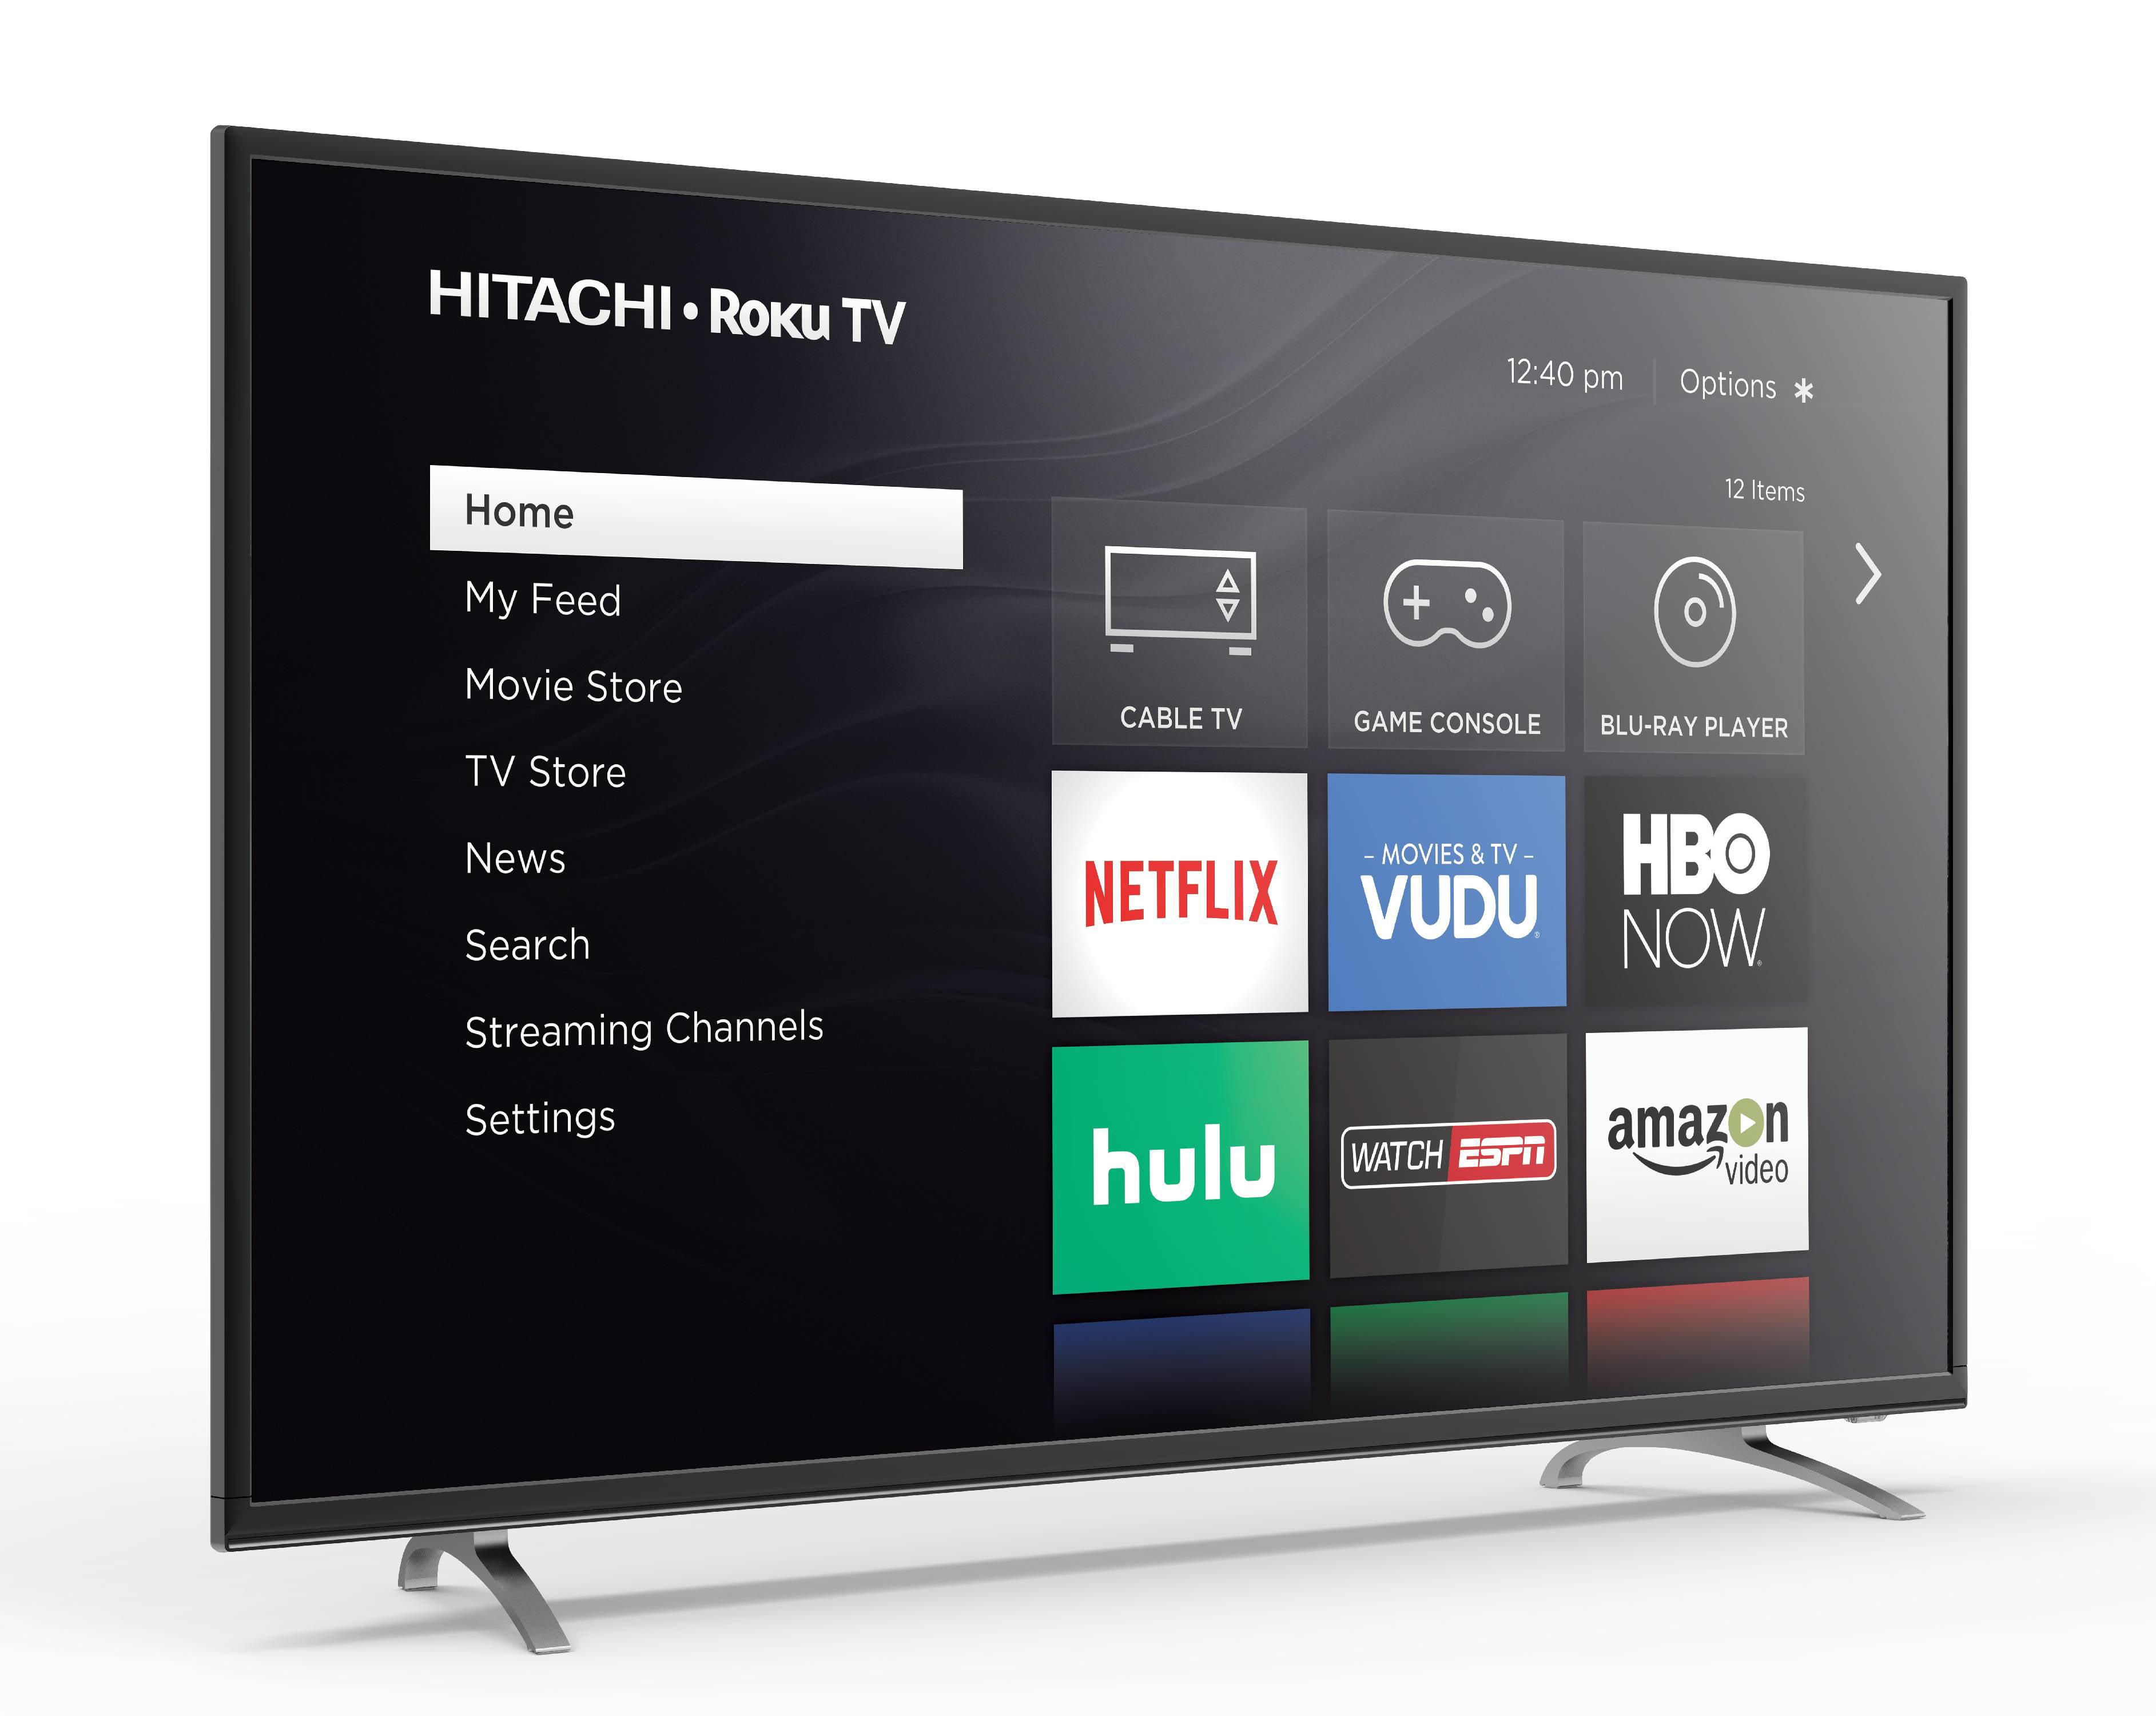 "Click here to buy Hitachi 60"" Class 4K (2160P) Roku Smart LED TV (60RH2) by Hitachi."